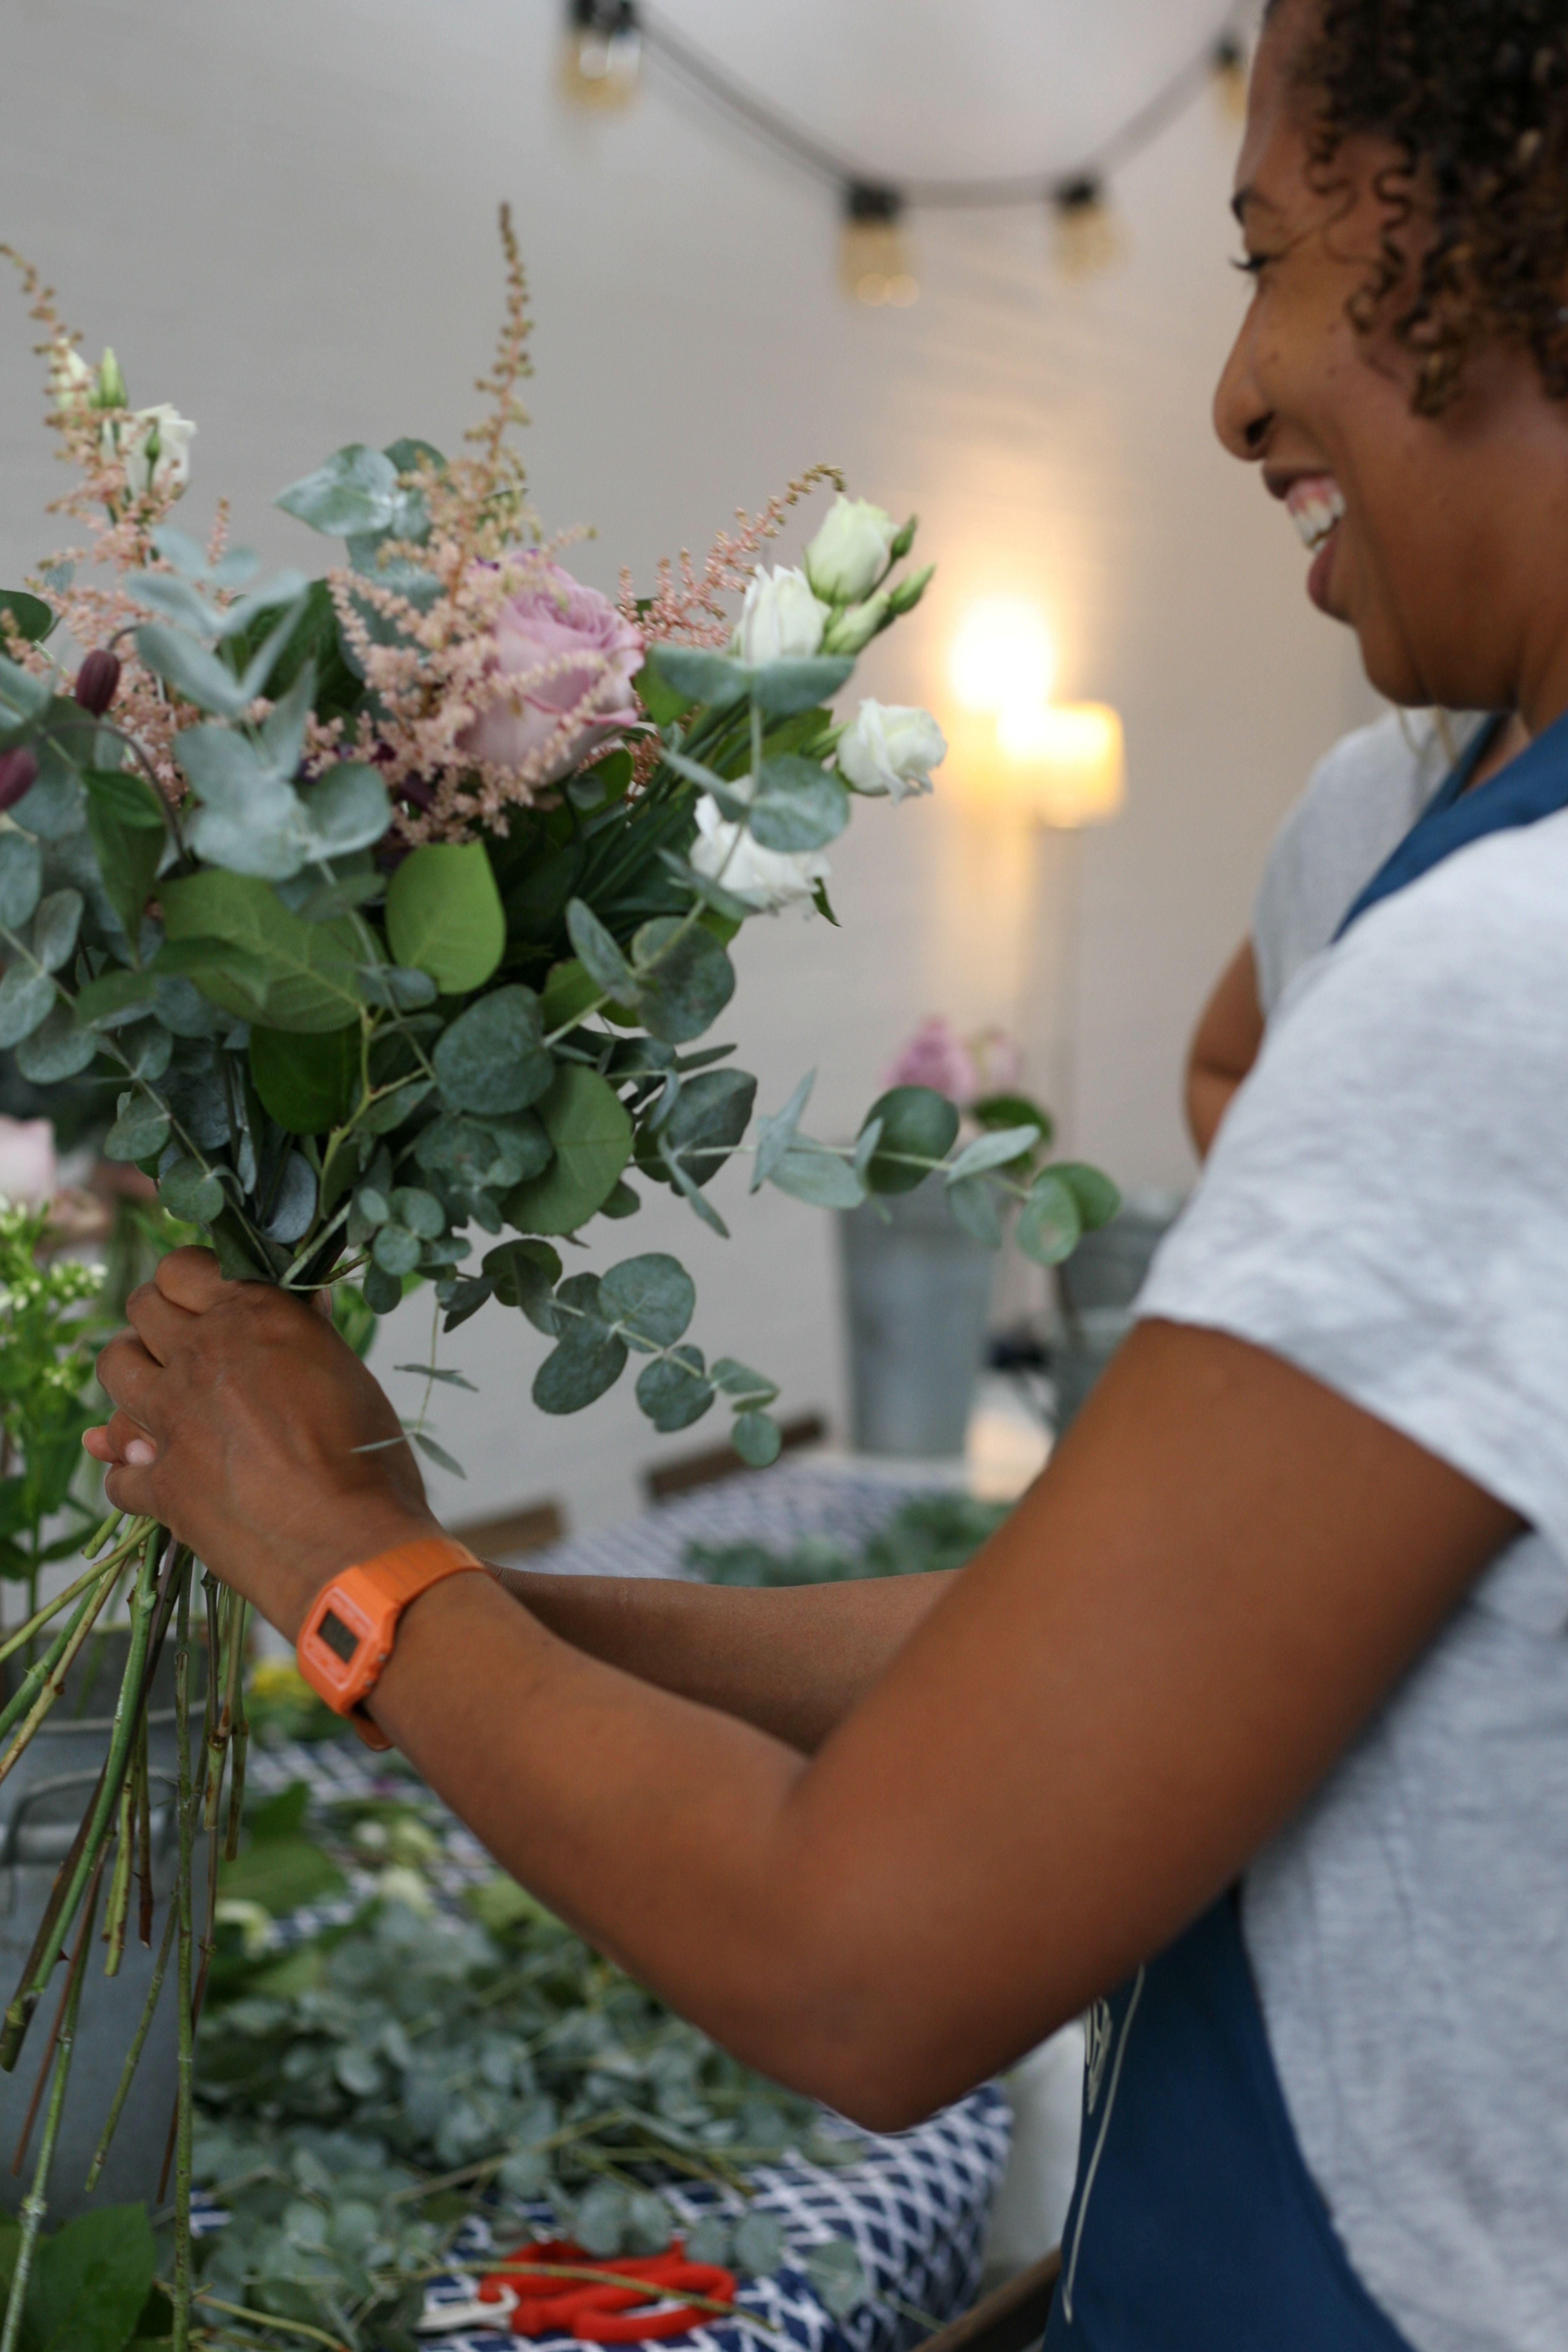 Pin By Gardenia Of London On Gardenia Of London Flower School Flower School Flowers Flower Vases